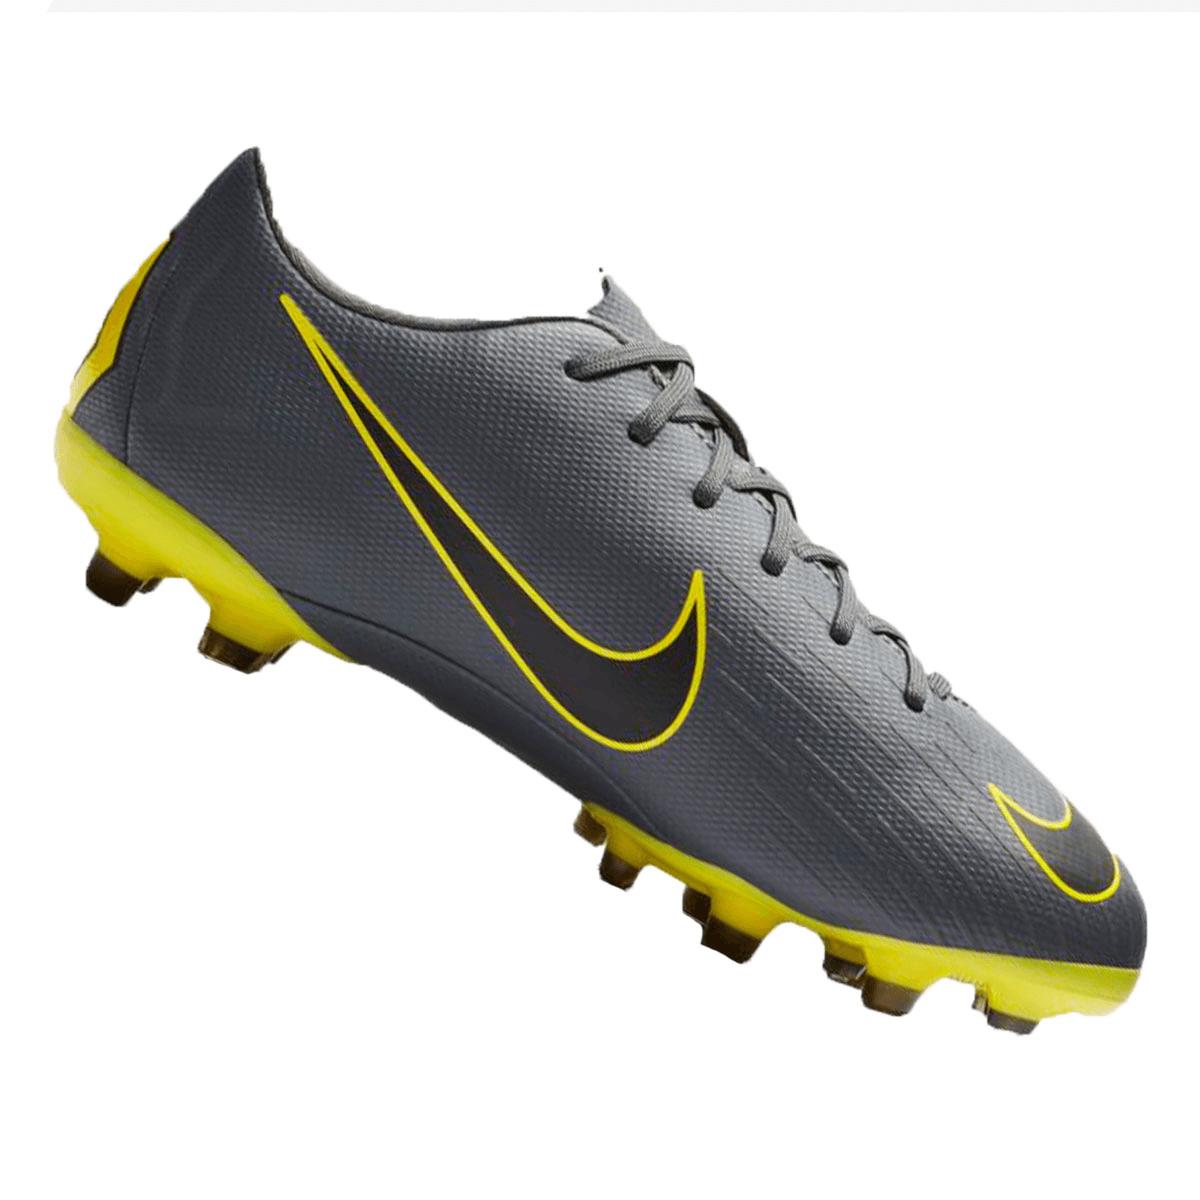 Nike Kinder Fußballschuh Mercurial Vapor XII JR Academy GS FGMG dunkelgraugelb